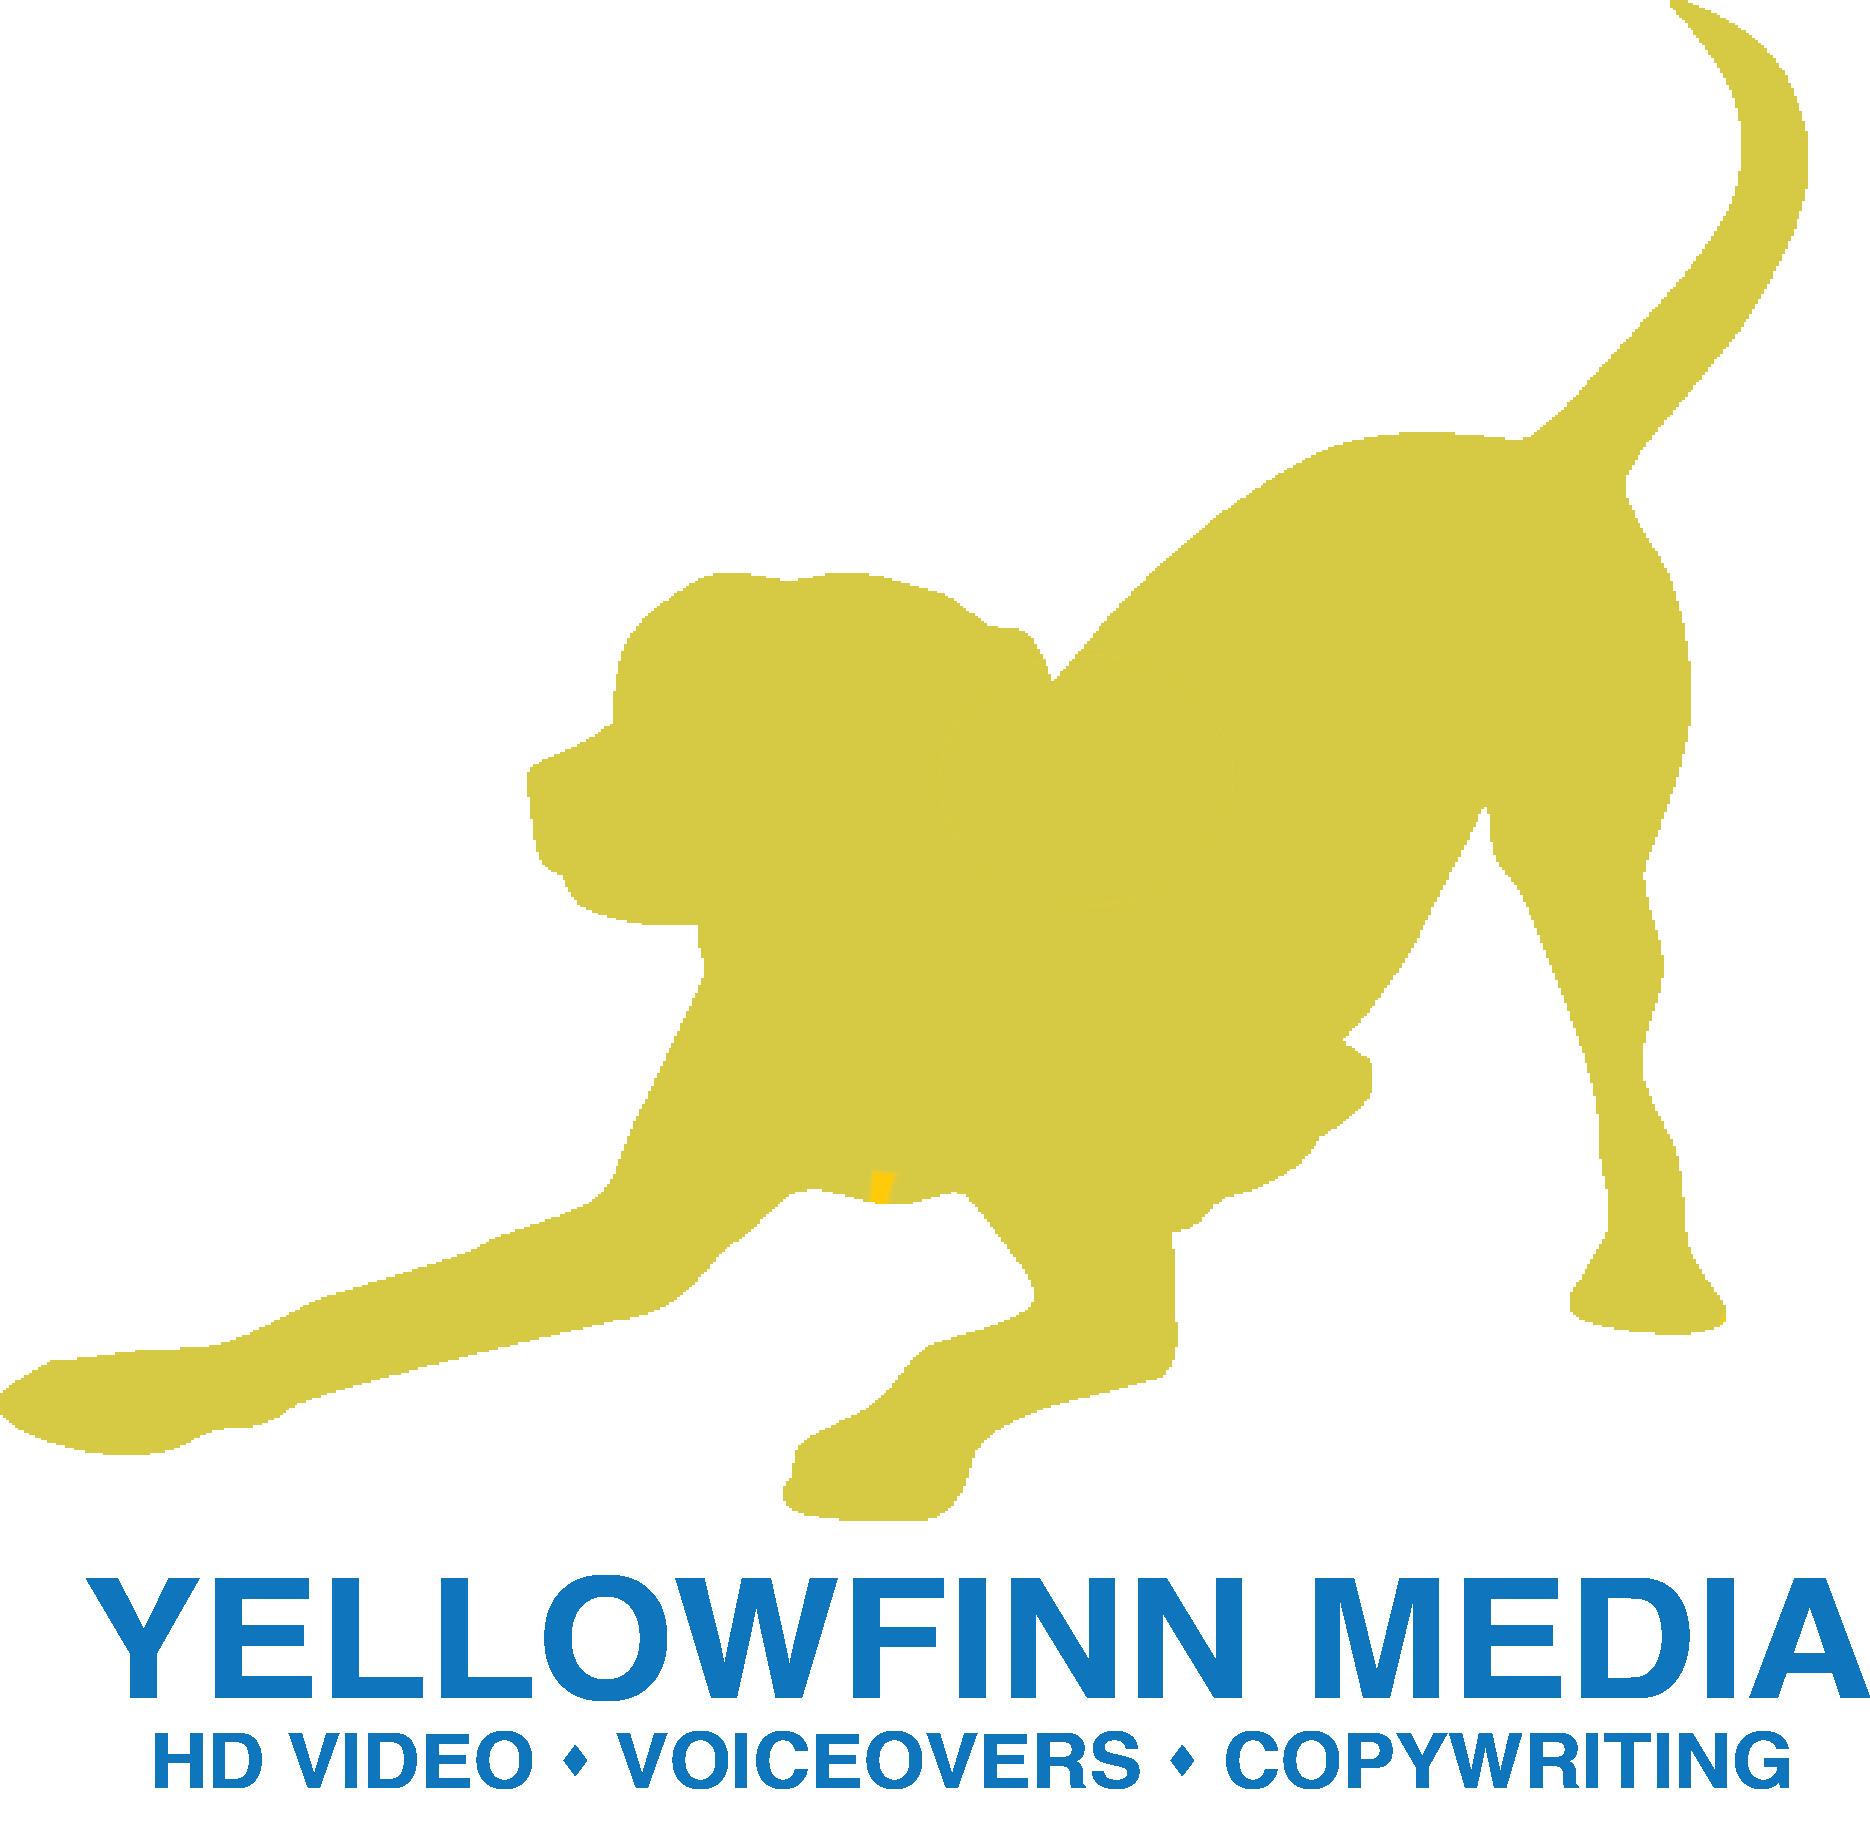 YELLOWFINN MEDIA